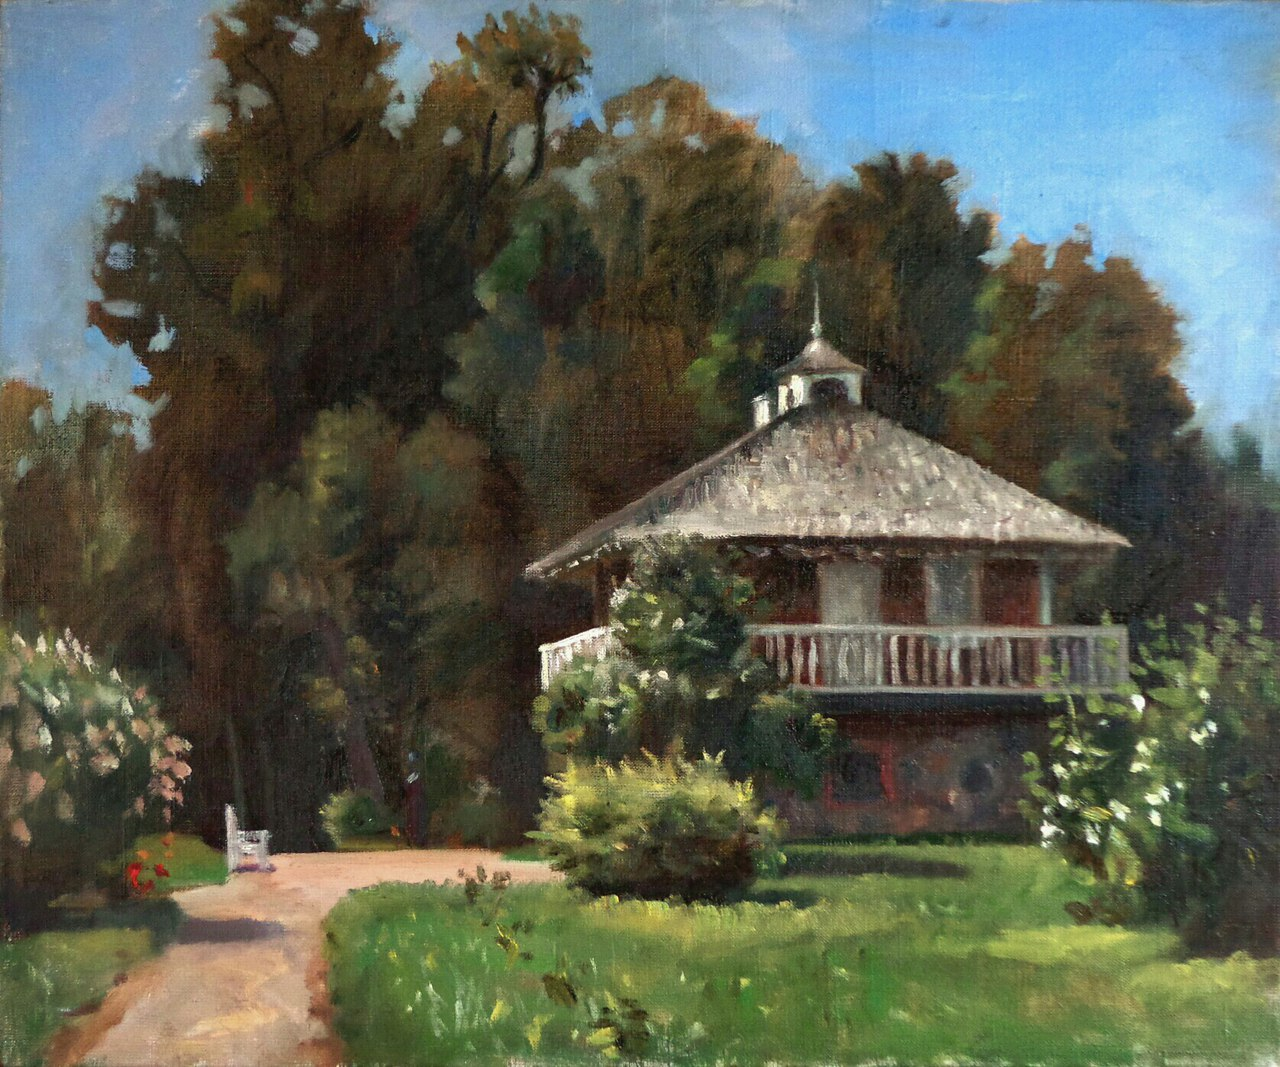 petrovskoe-hannibal_house